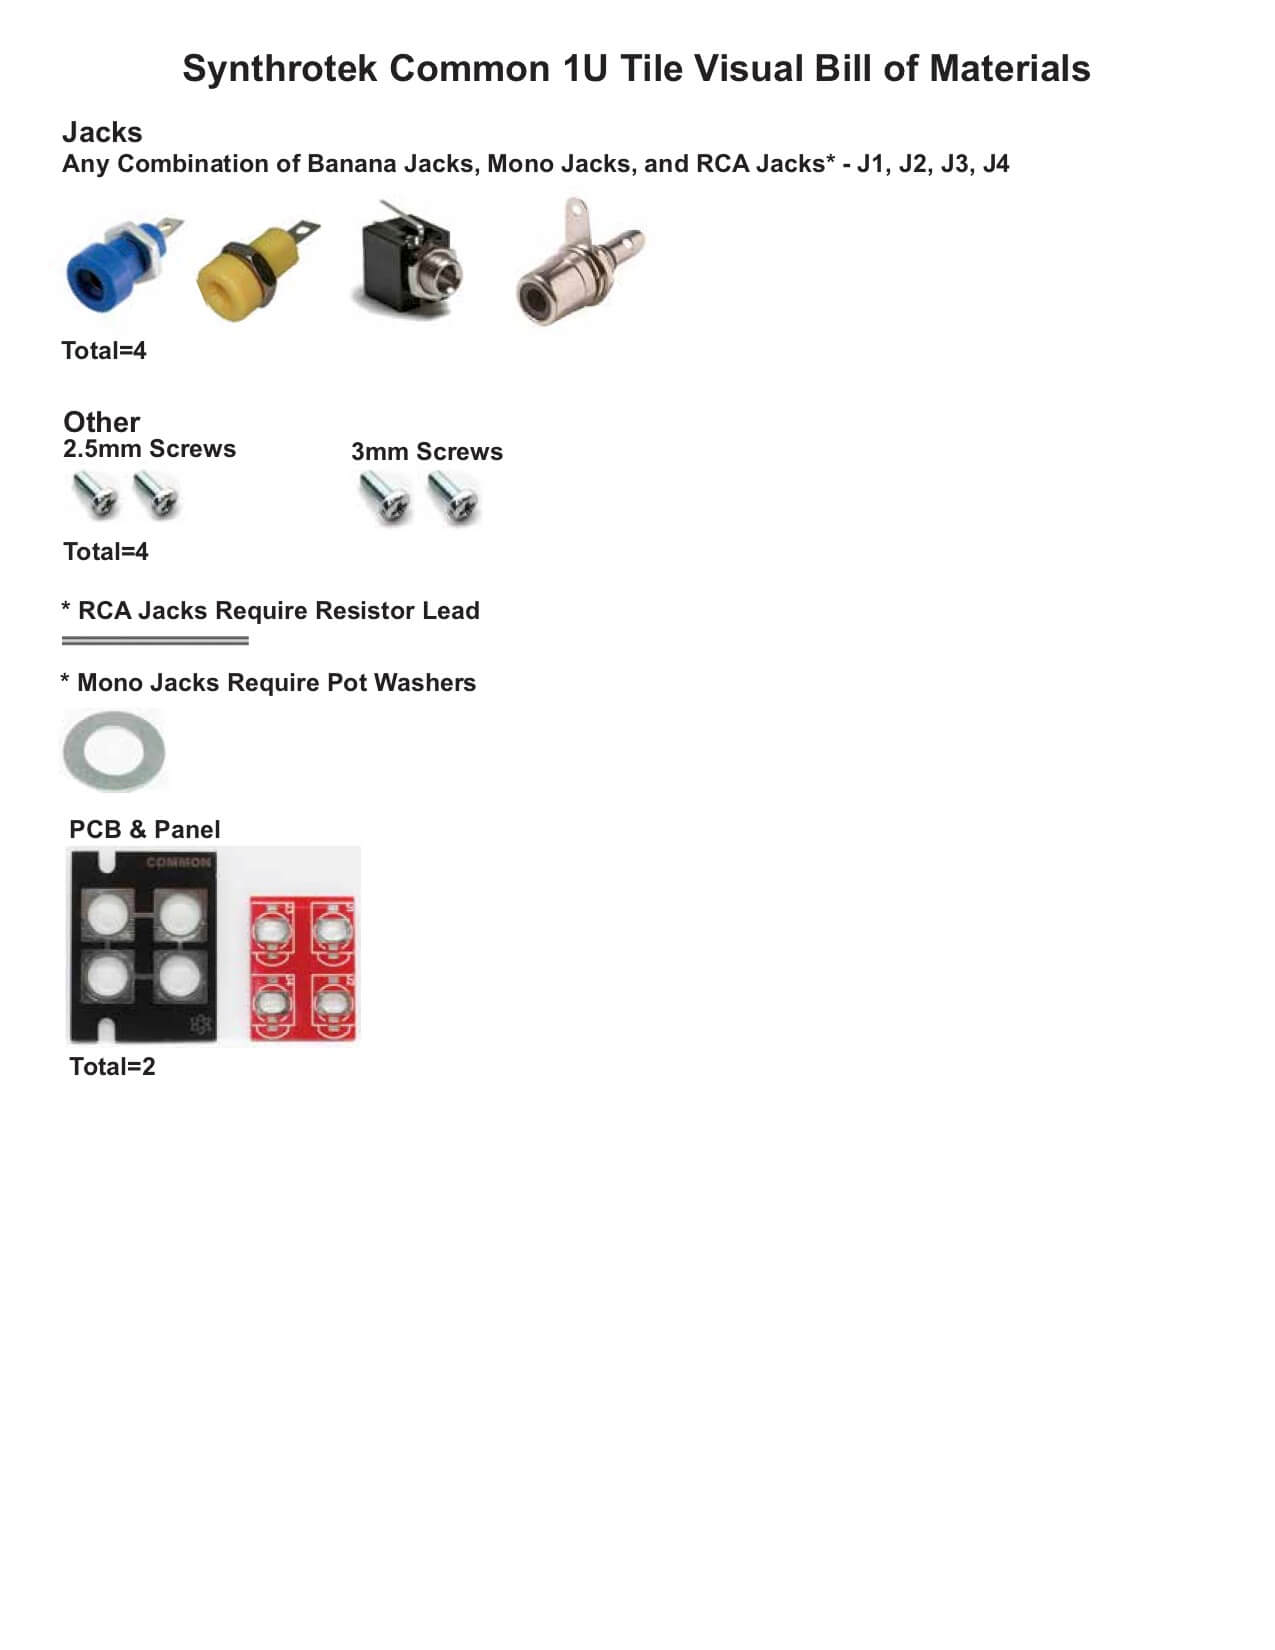 Common 1U Tile Bill of Materials